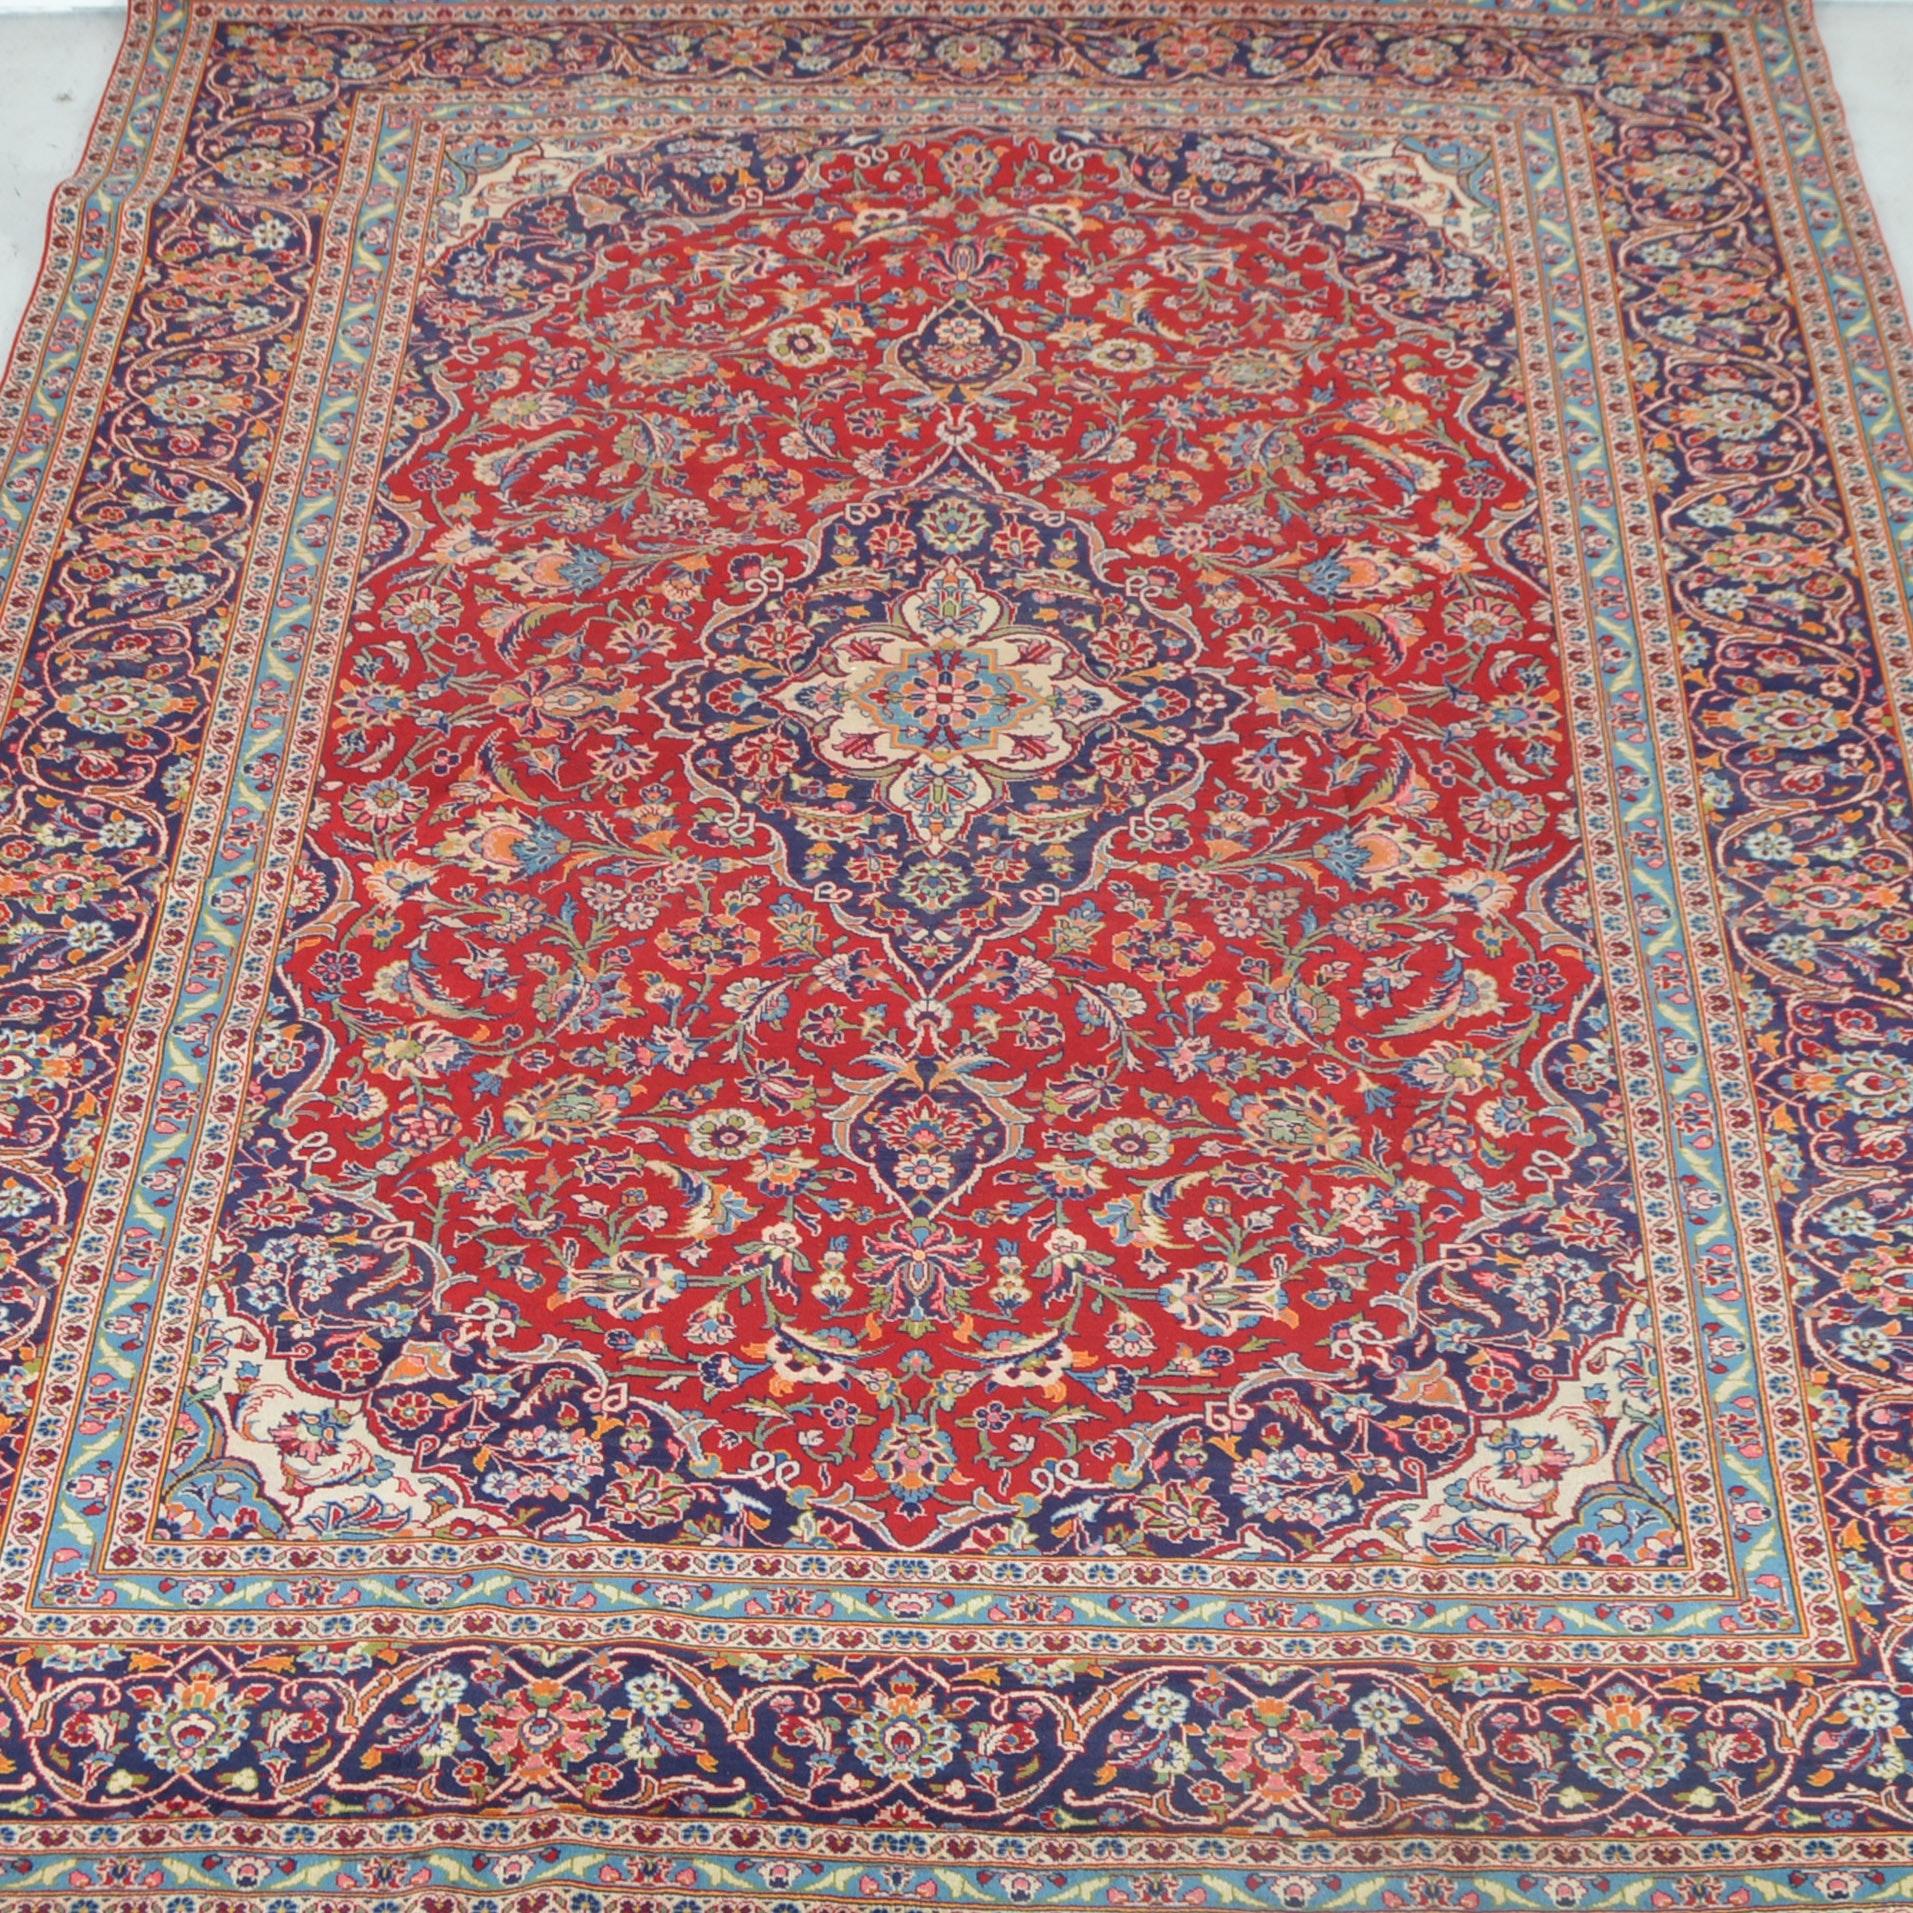 Large Handwoven Tabriz Style Rug